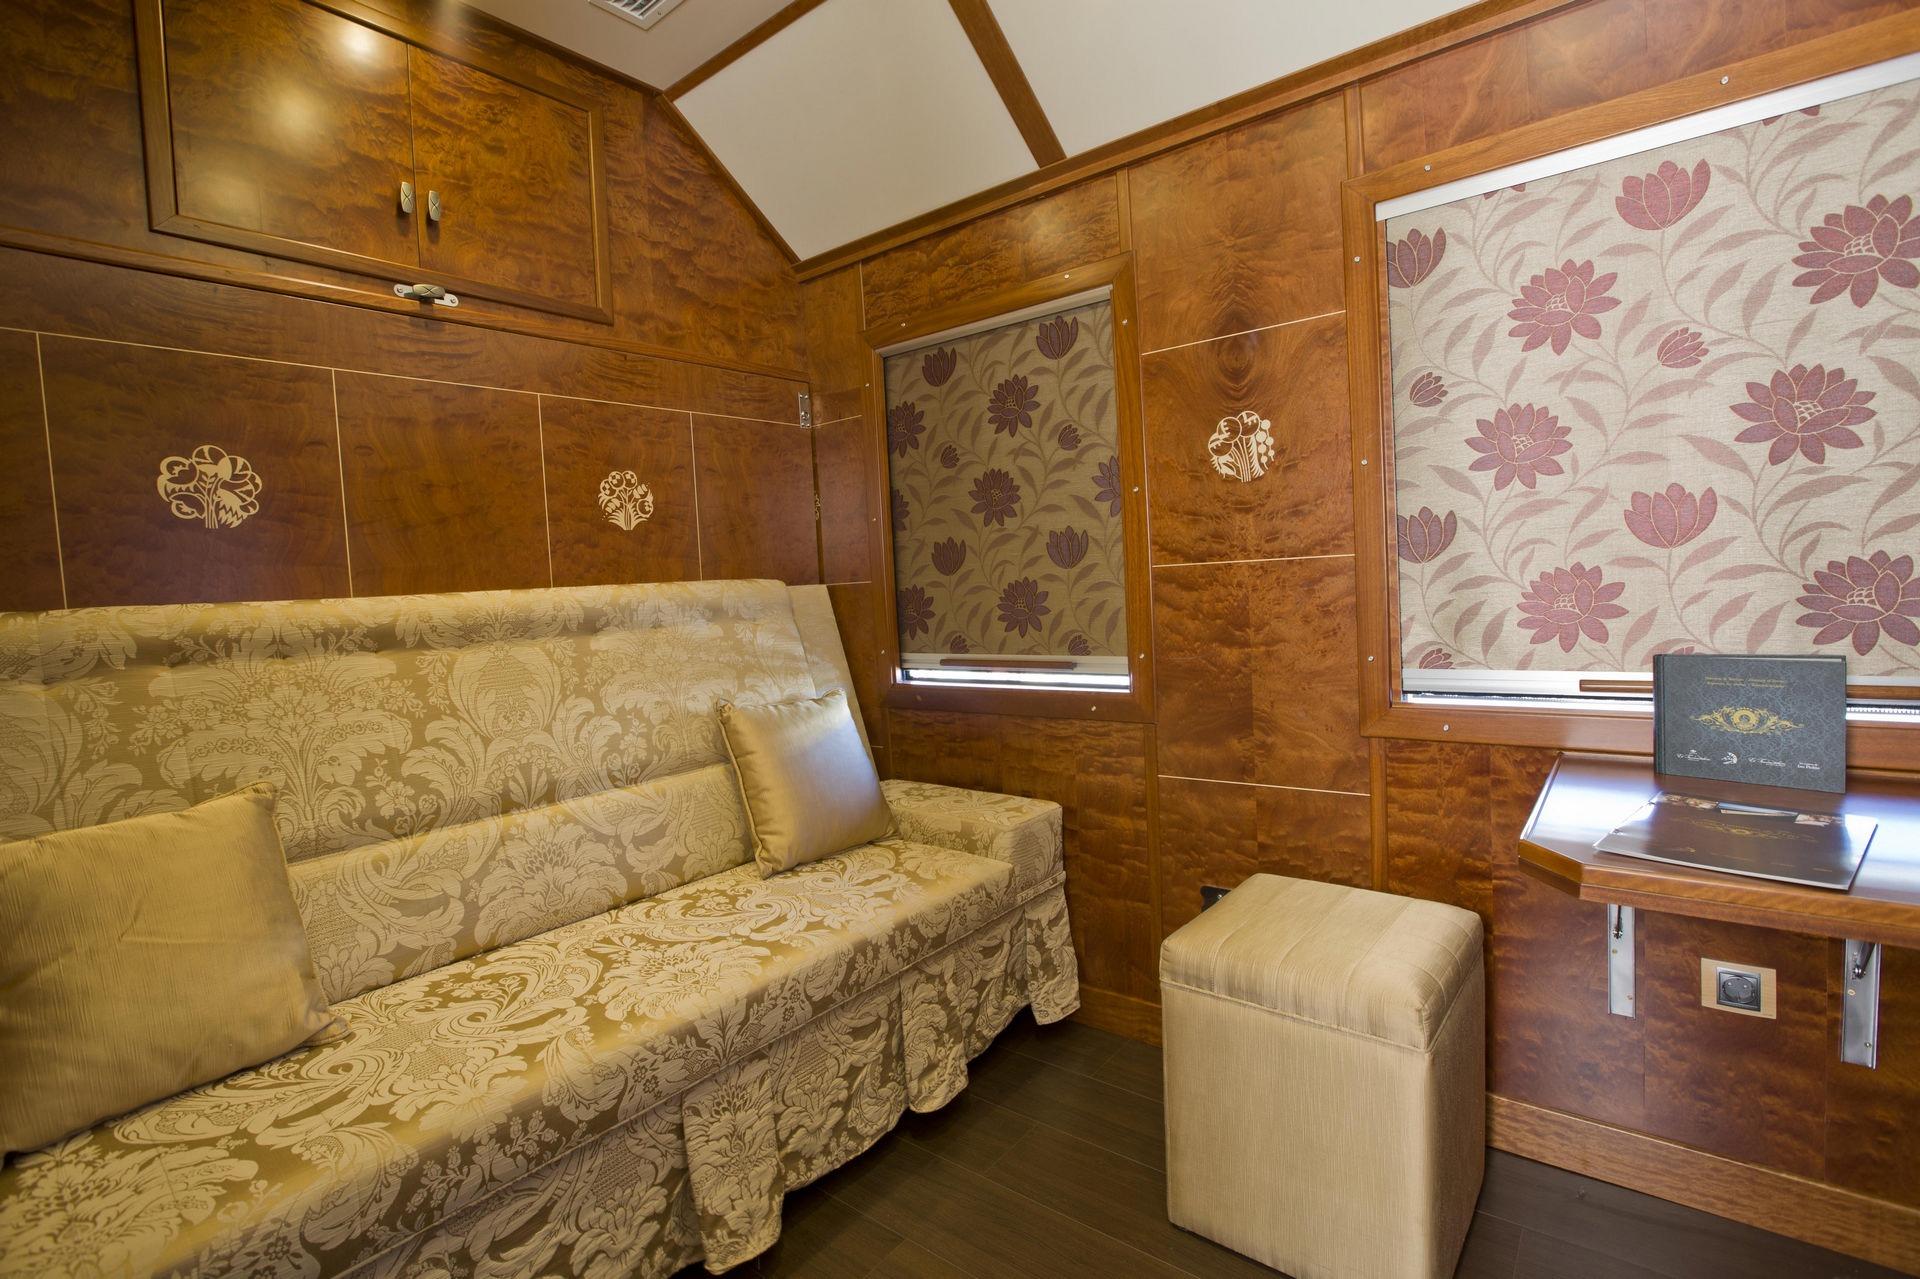 NOMAD-luksusowe-pociągi-w-Hiszpani-Al-Andalus-05